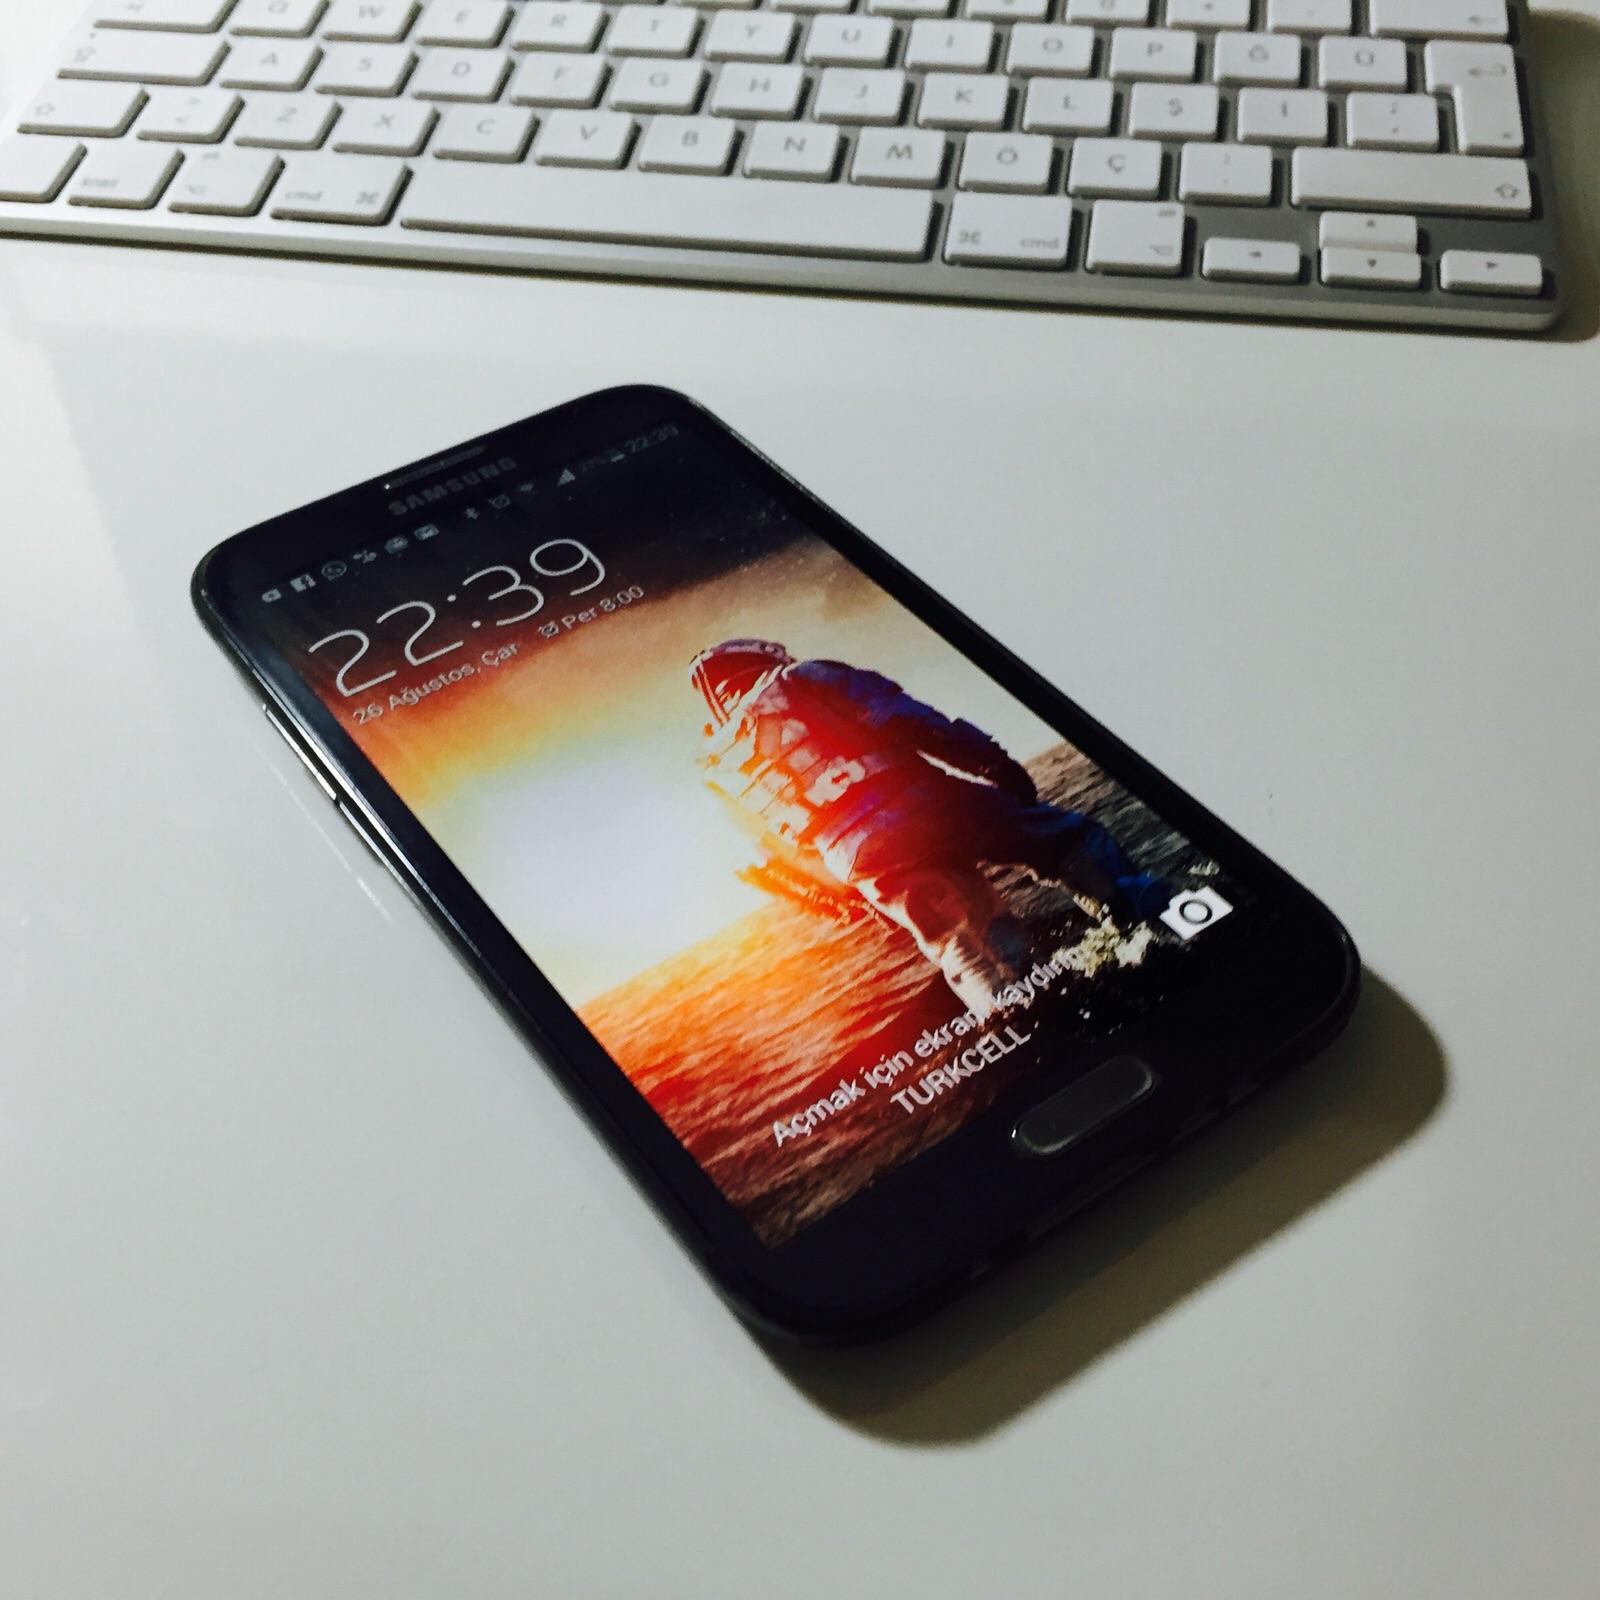 samsung-galaxy-note-2-telefonum